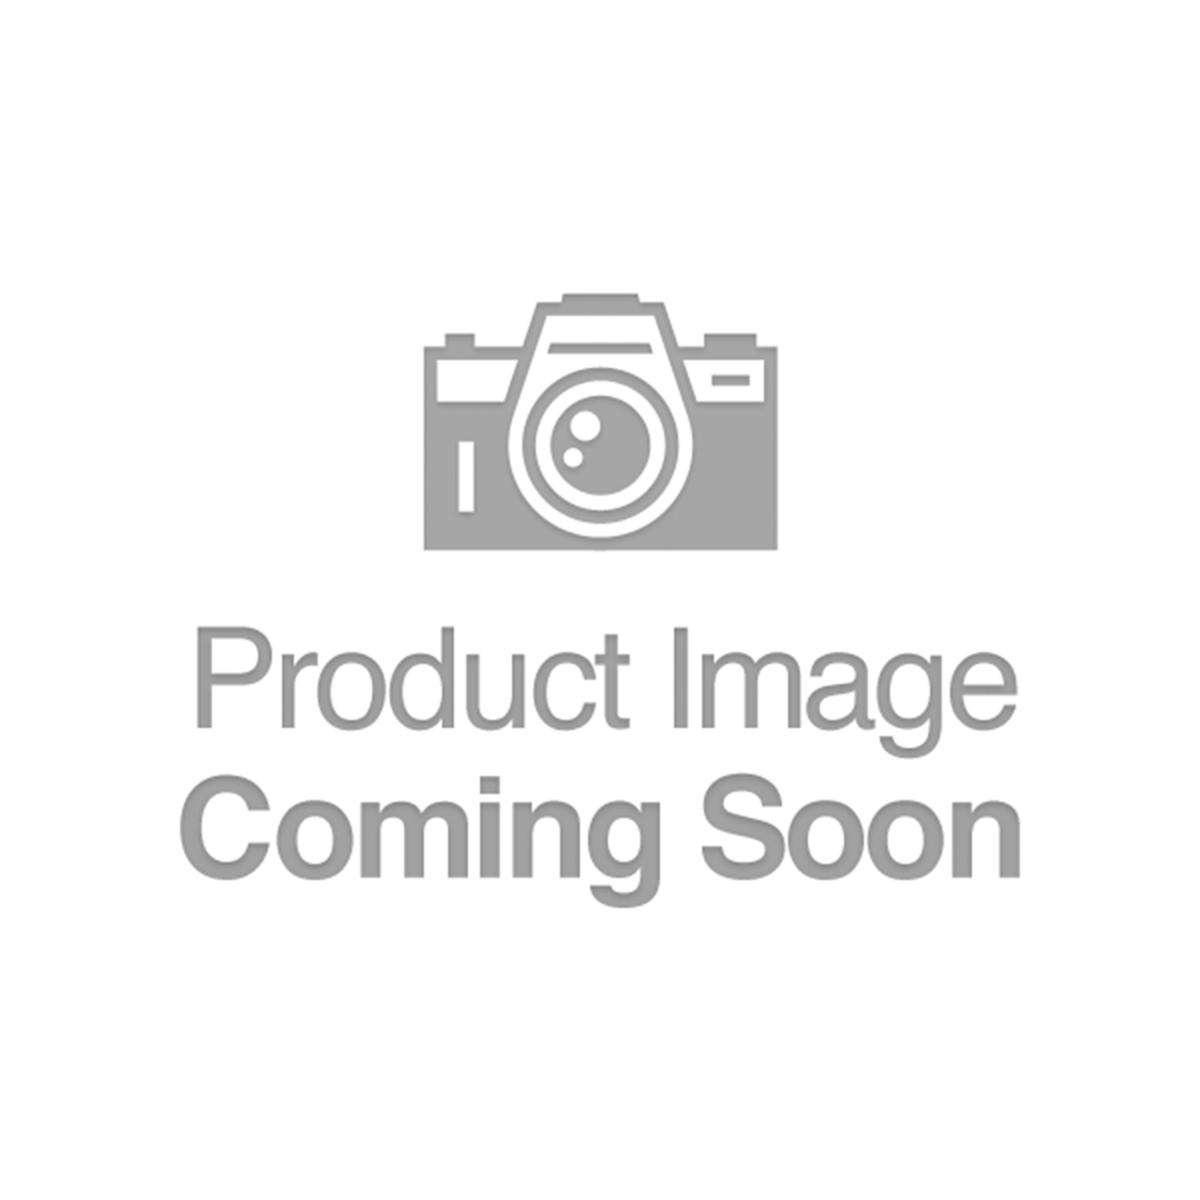 FR. 1700 $10 1933 Silver Certificate PCGS 25 PPQ